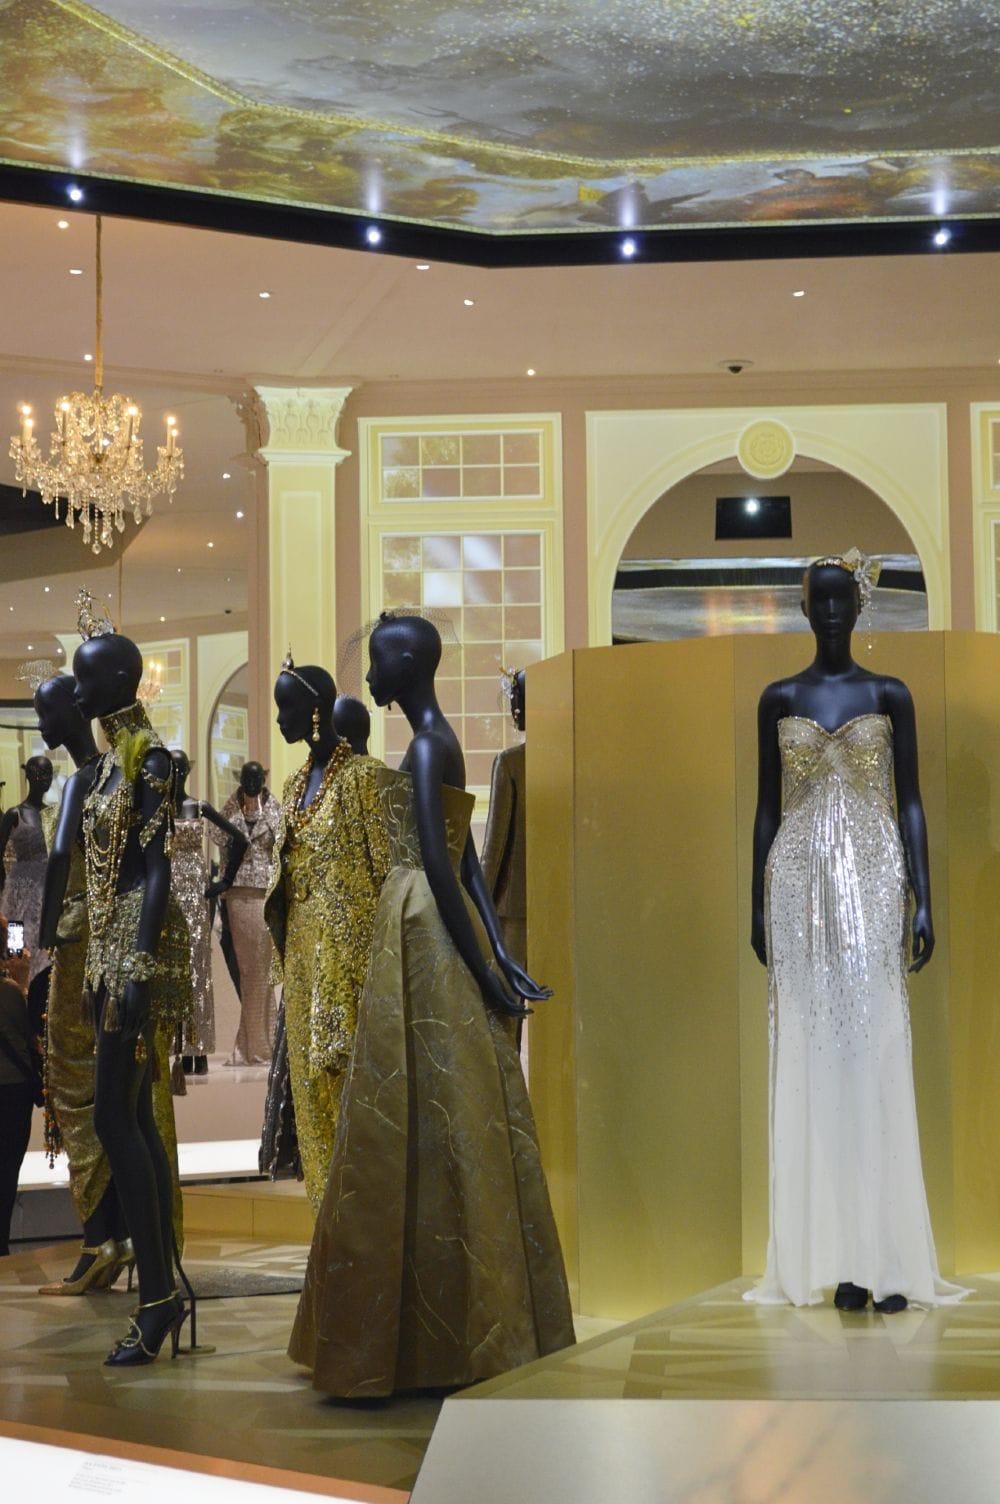 Christian Dior Ballroom Gowns